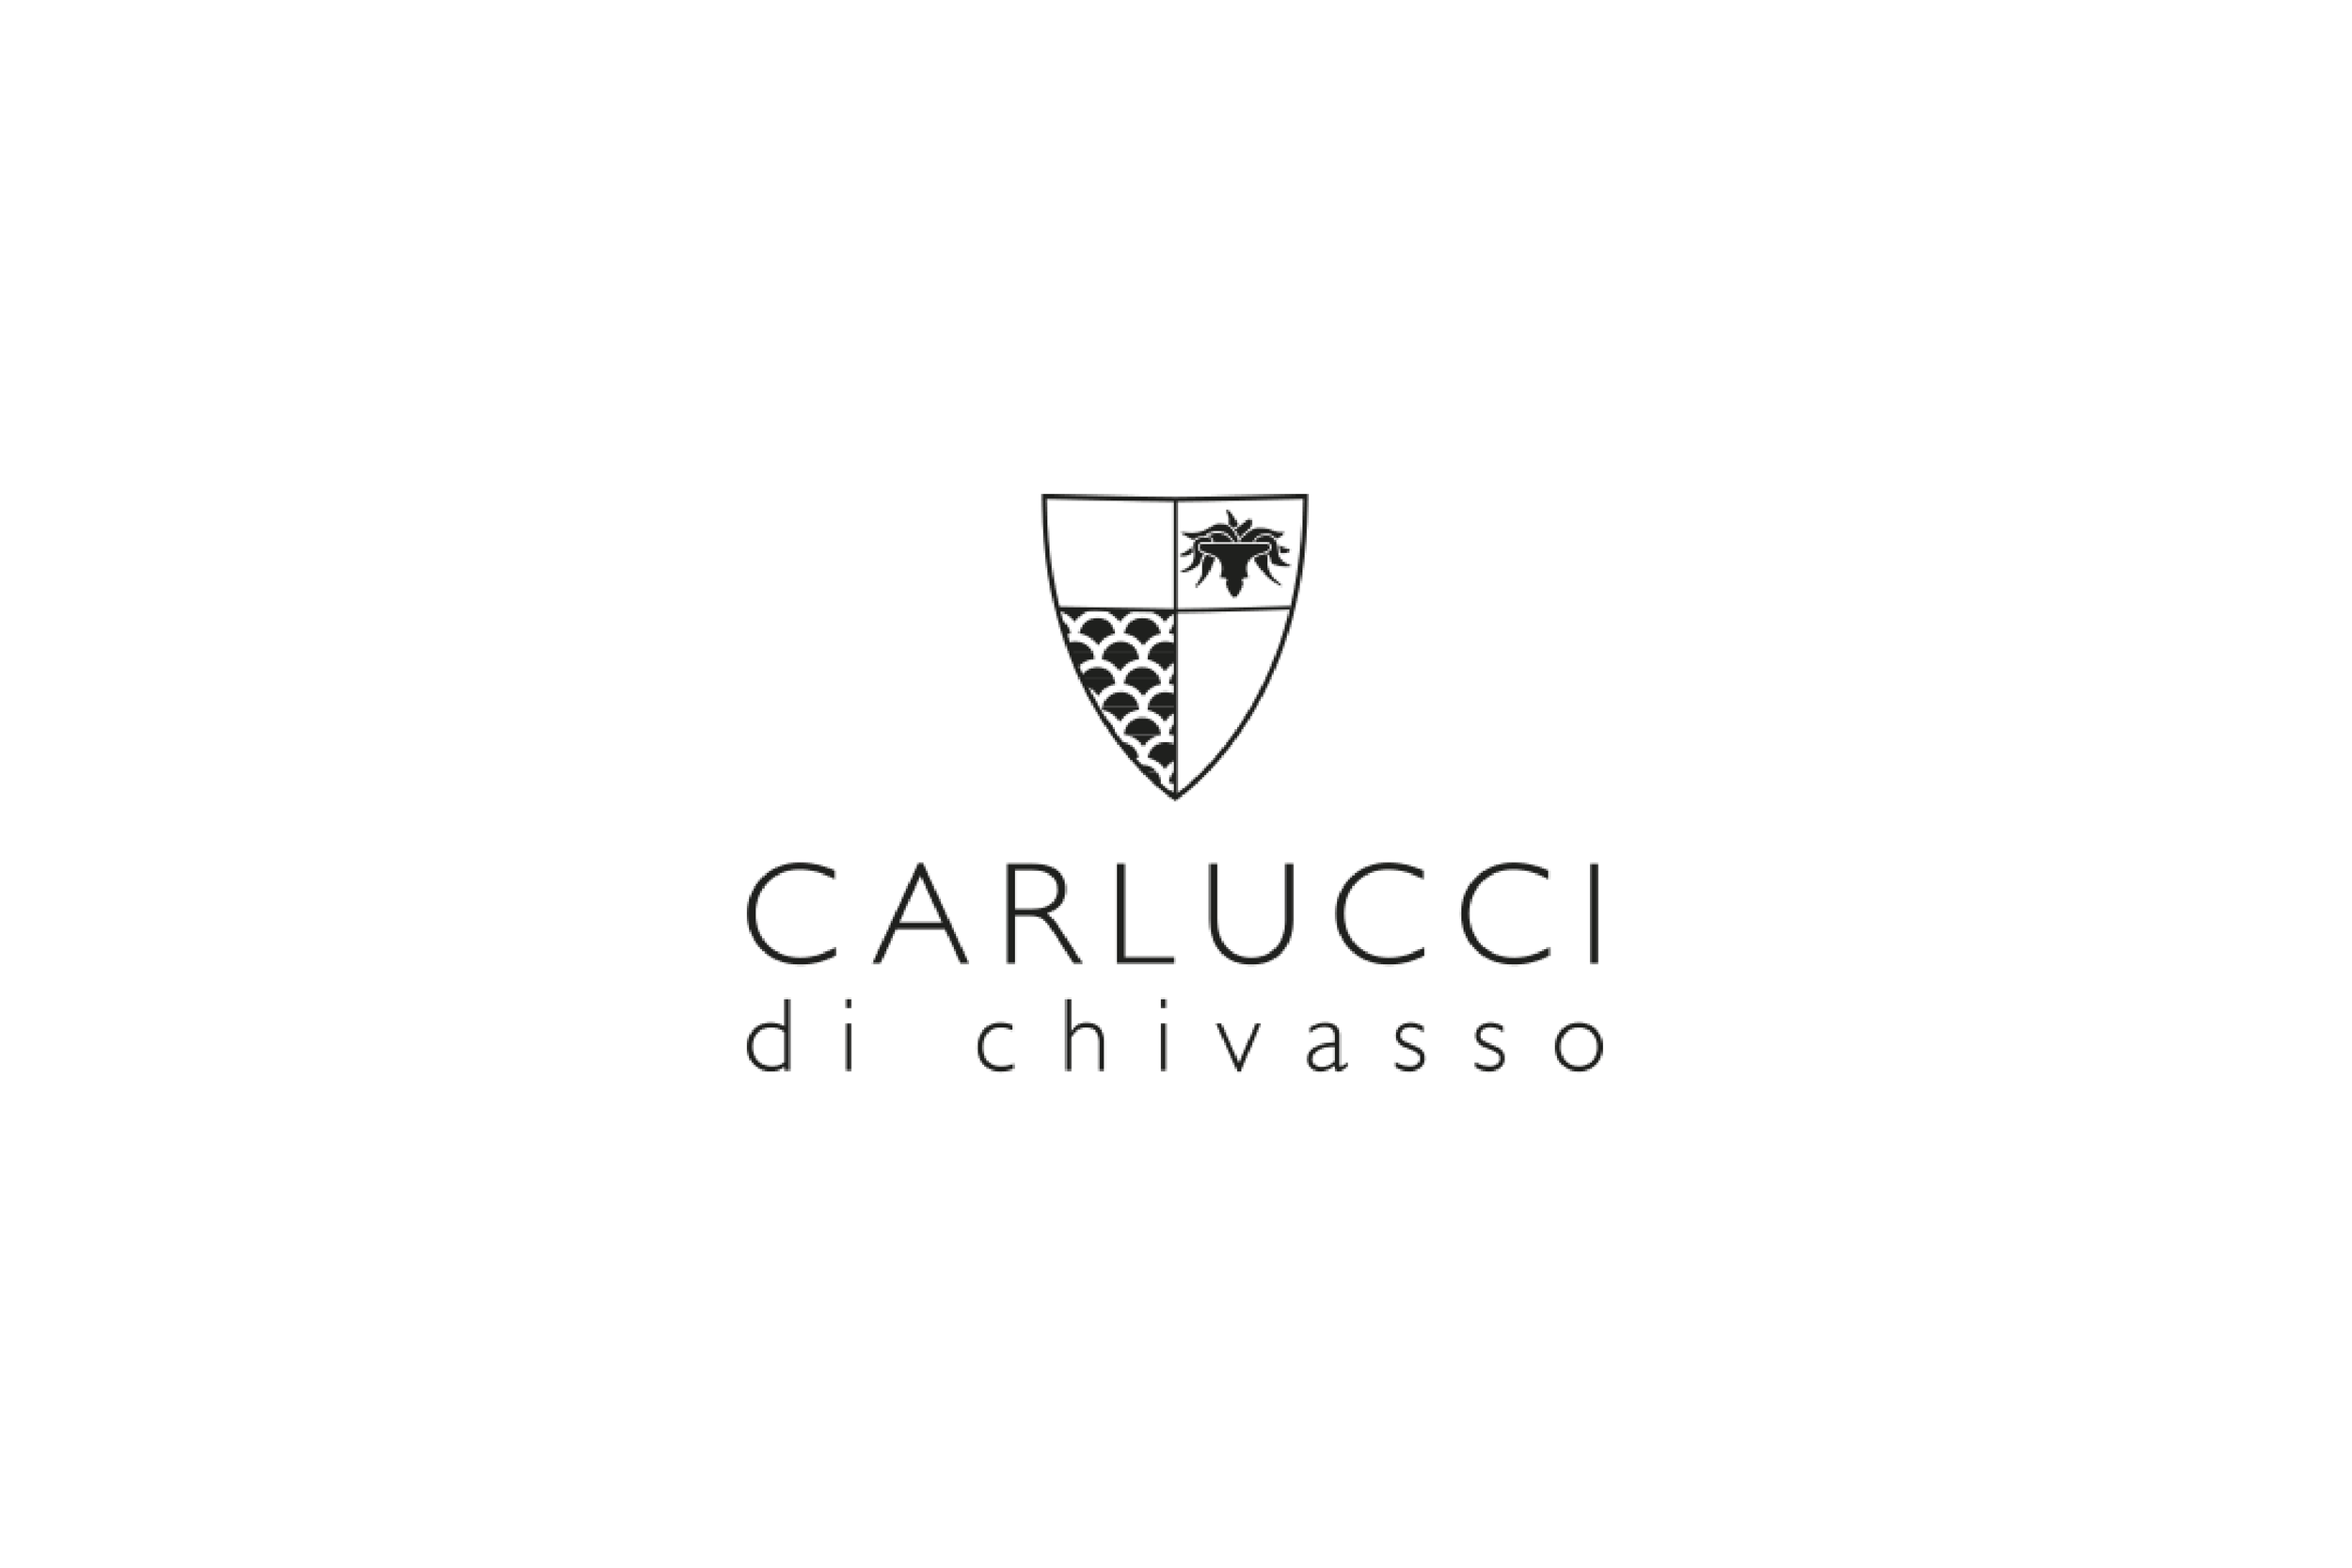 Carlucci-01.png